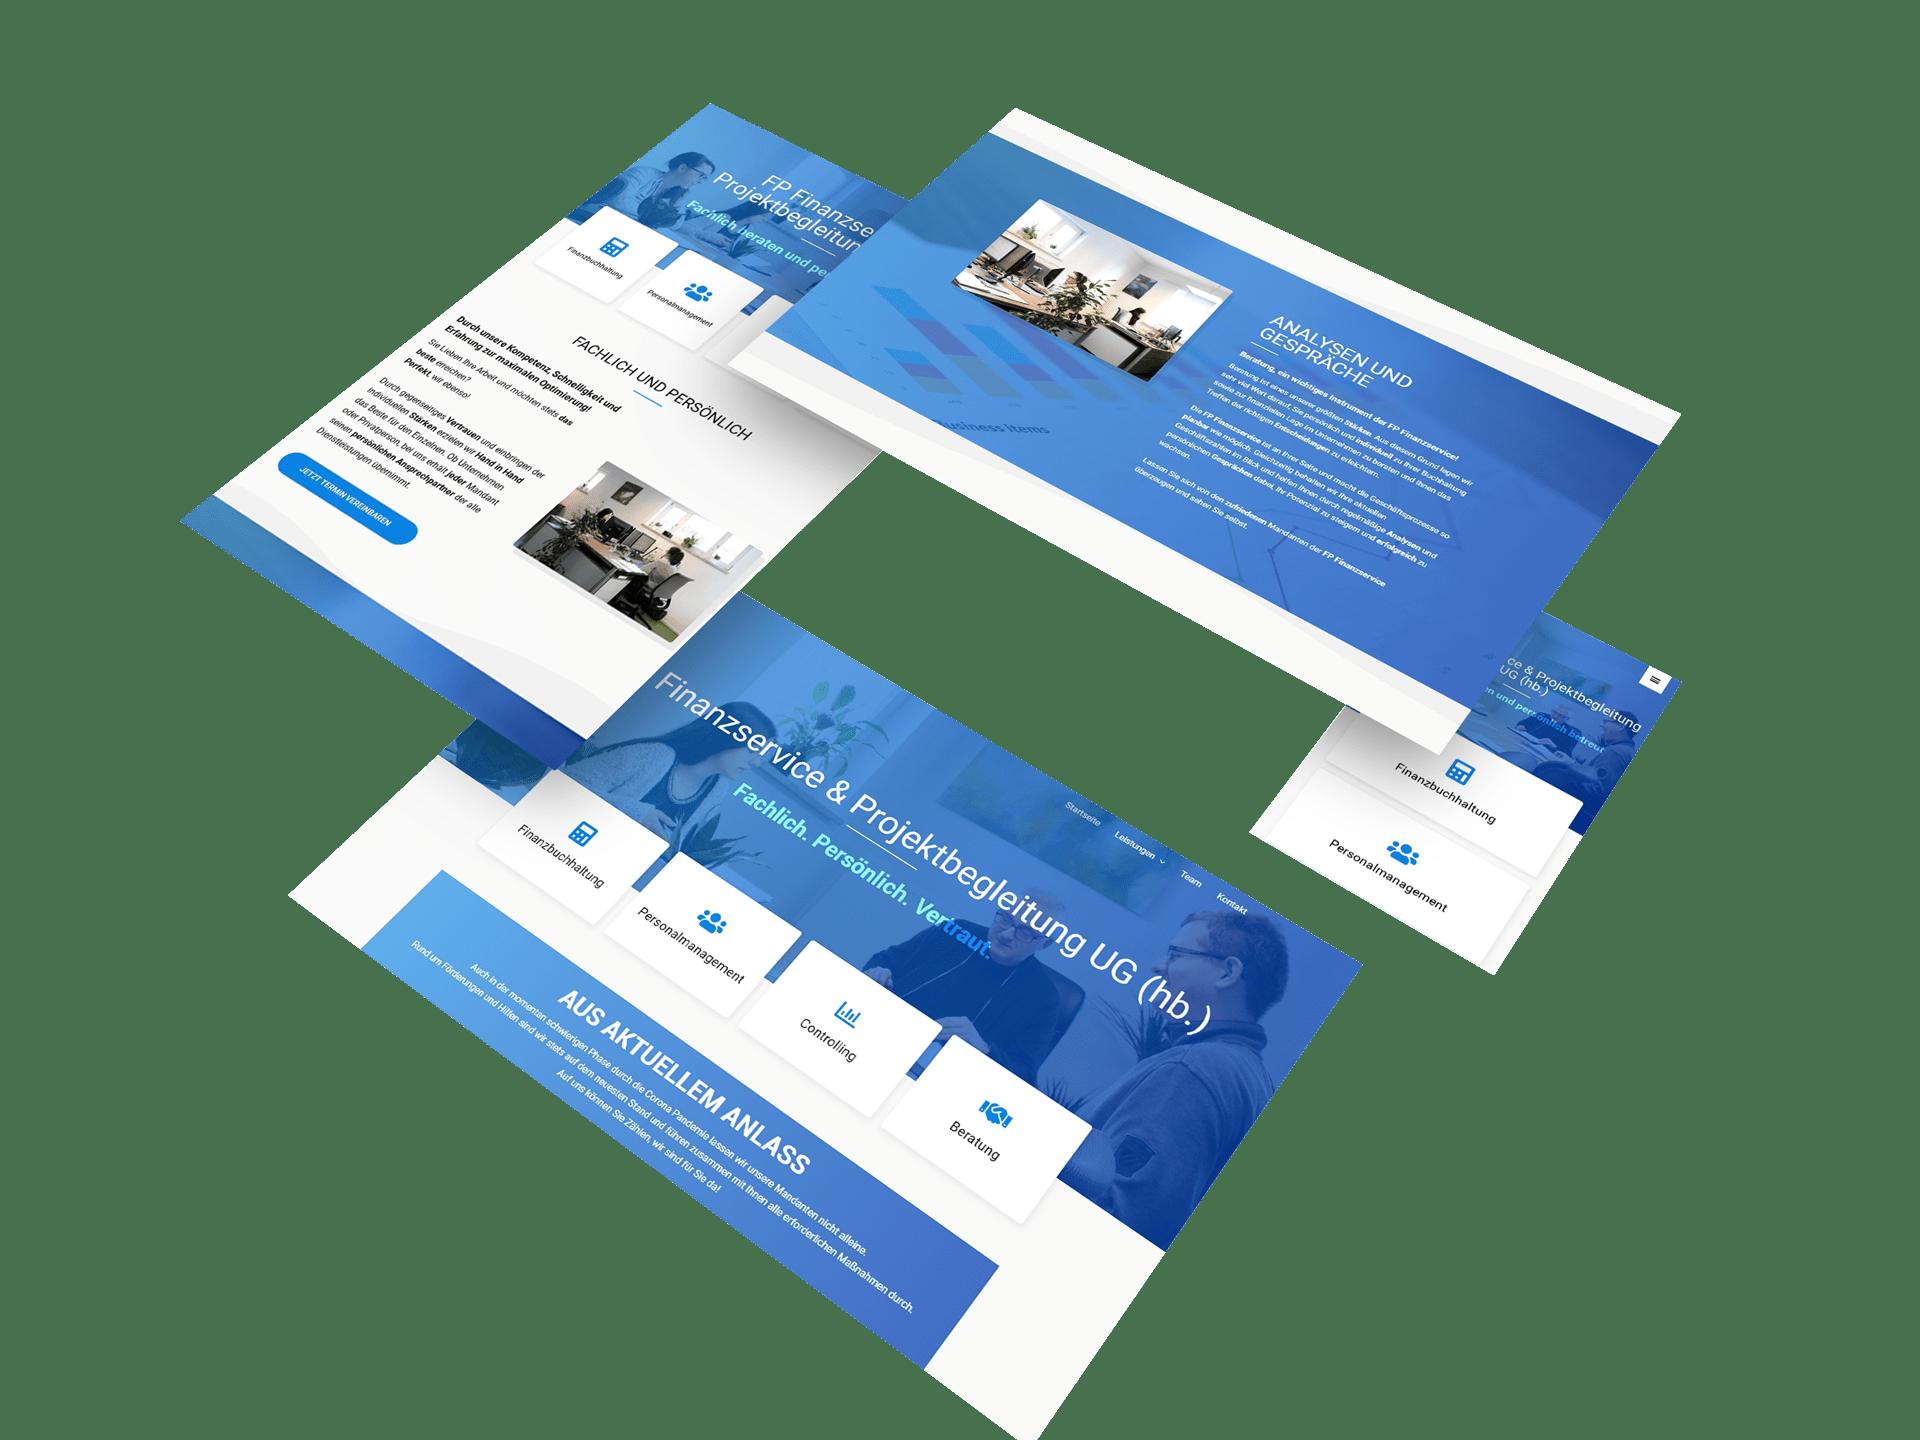 Malina Webdesign - Referenzen FP Finanzservice